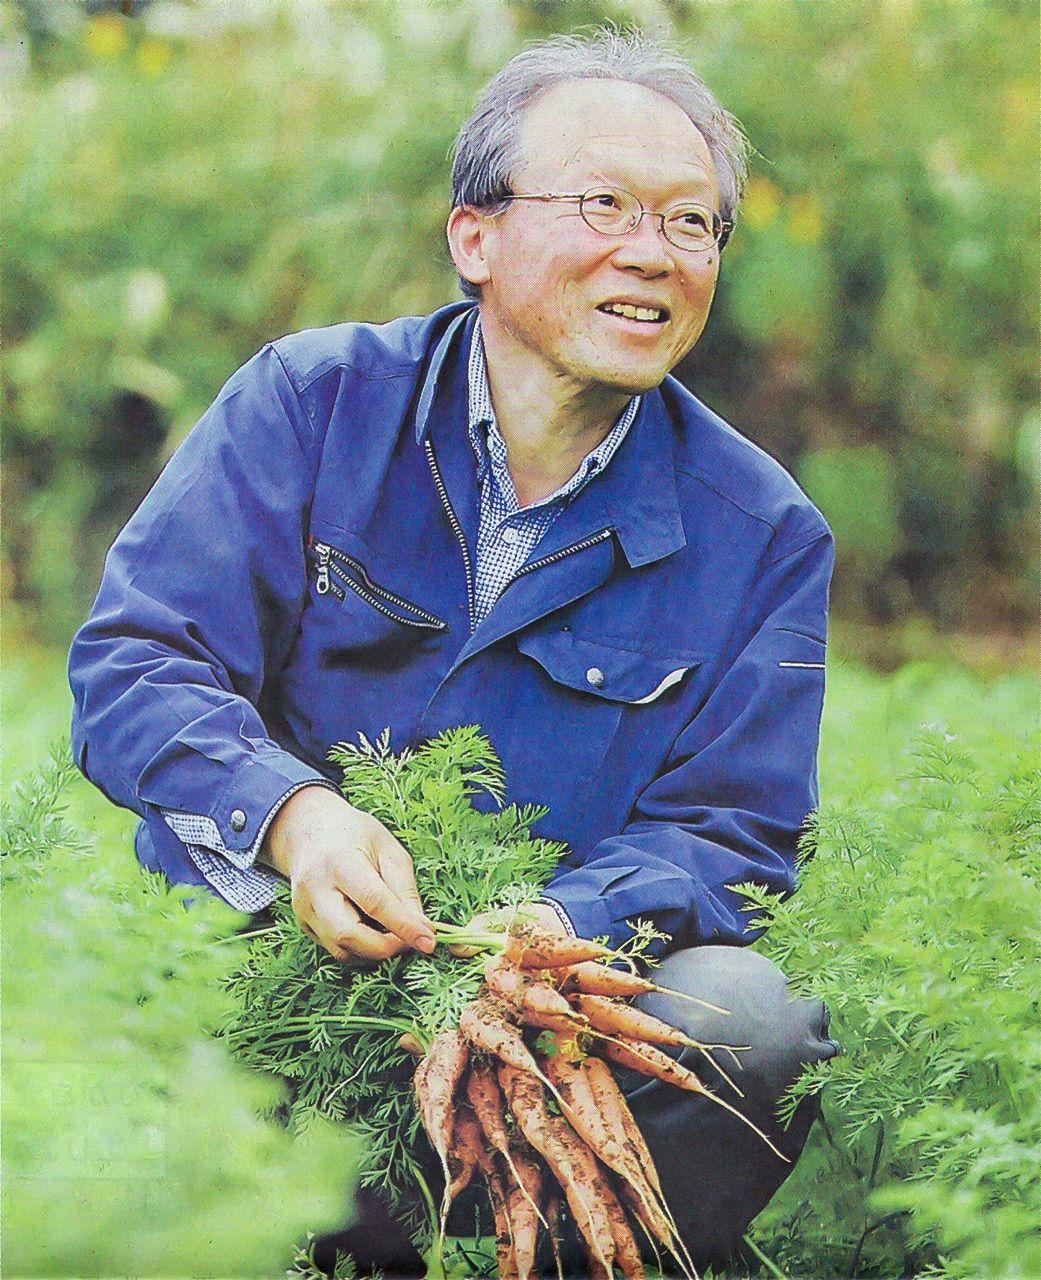 Ёсида Тосимити (фотография Тадзуноки Акихиро, газета «Нагасаки симбун»)